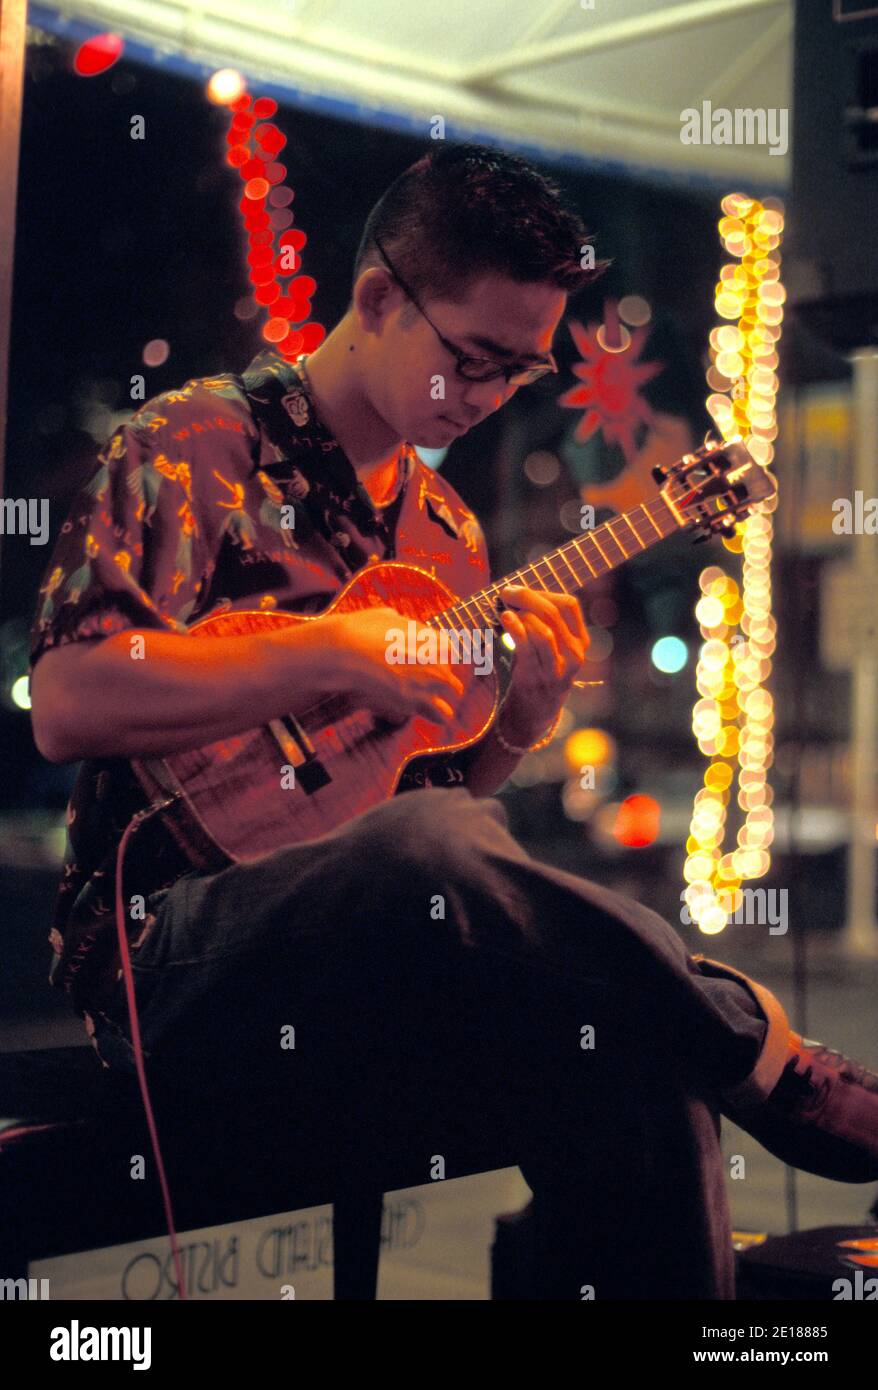 Local Hawaiian favorite ukulele maestro Jake Shimabukuro performing at Aloha Tower Foto de stock